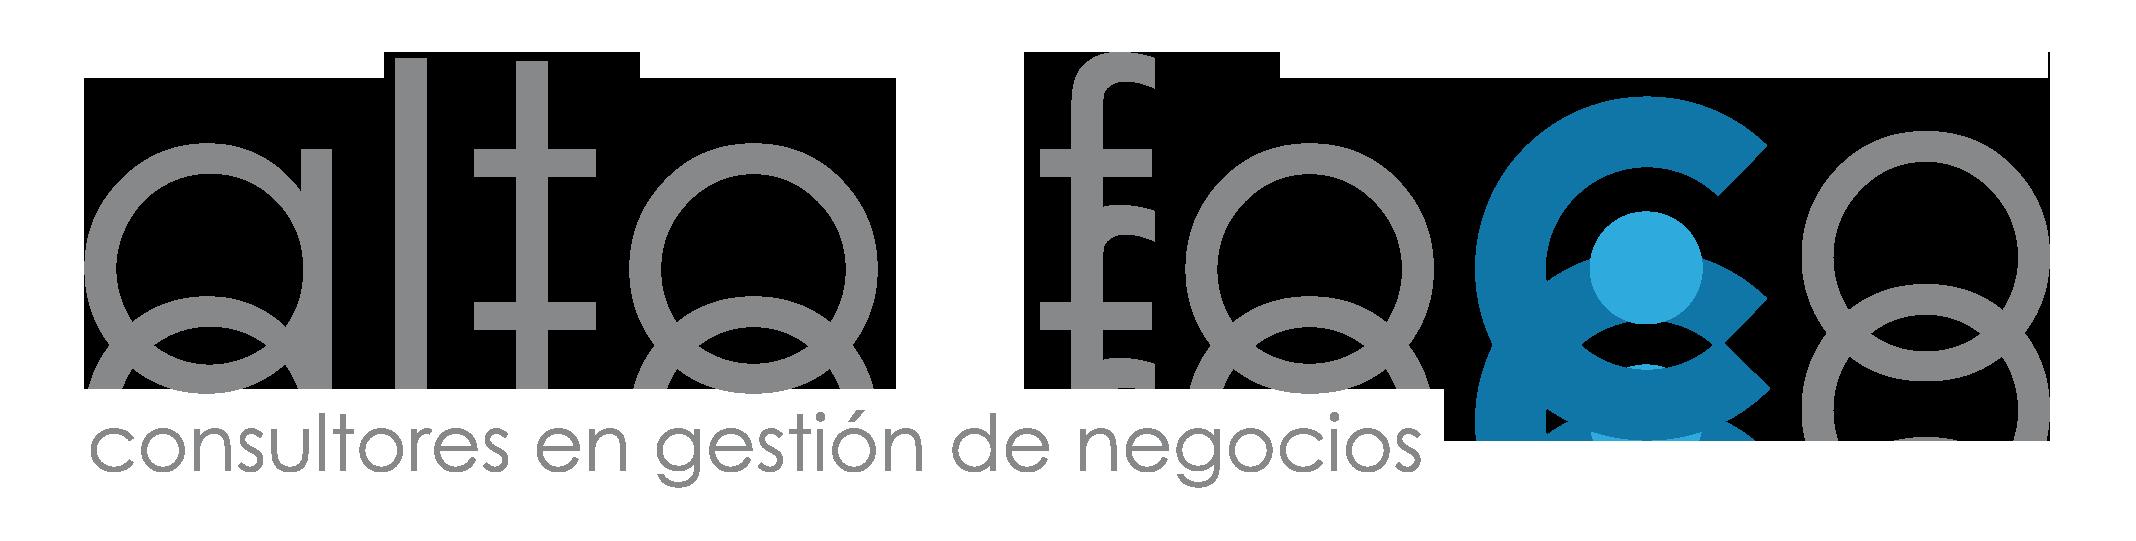 Empresas Desafio10x: Alto Foco SpA